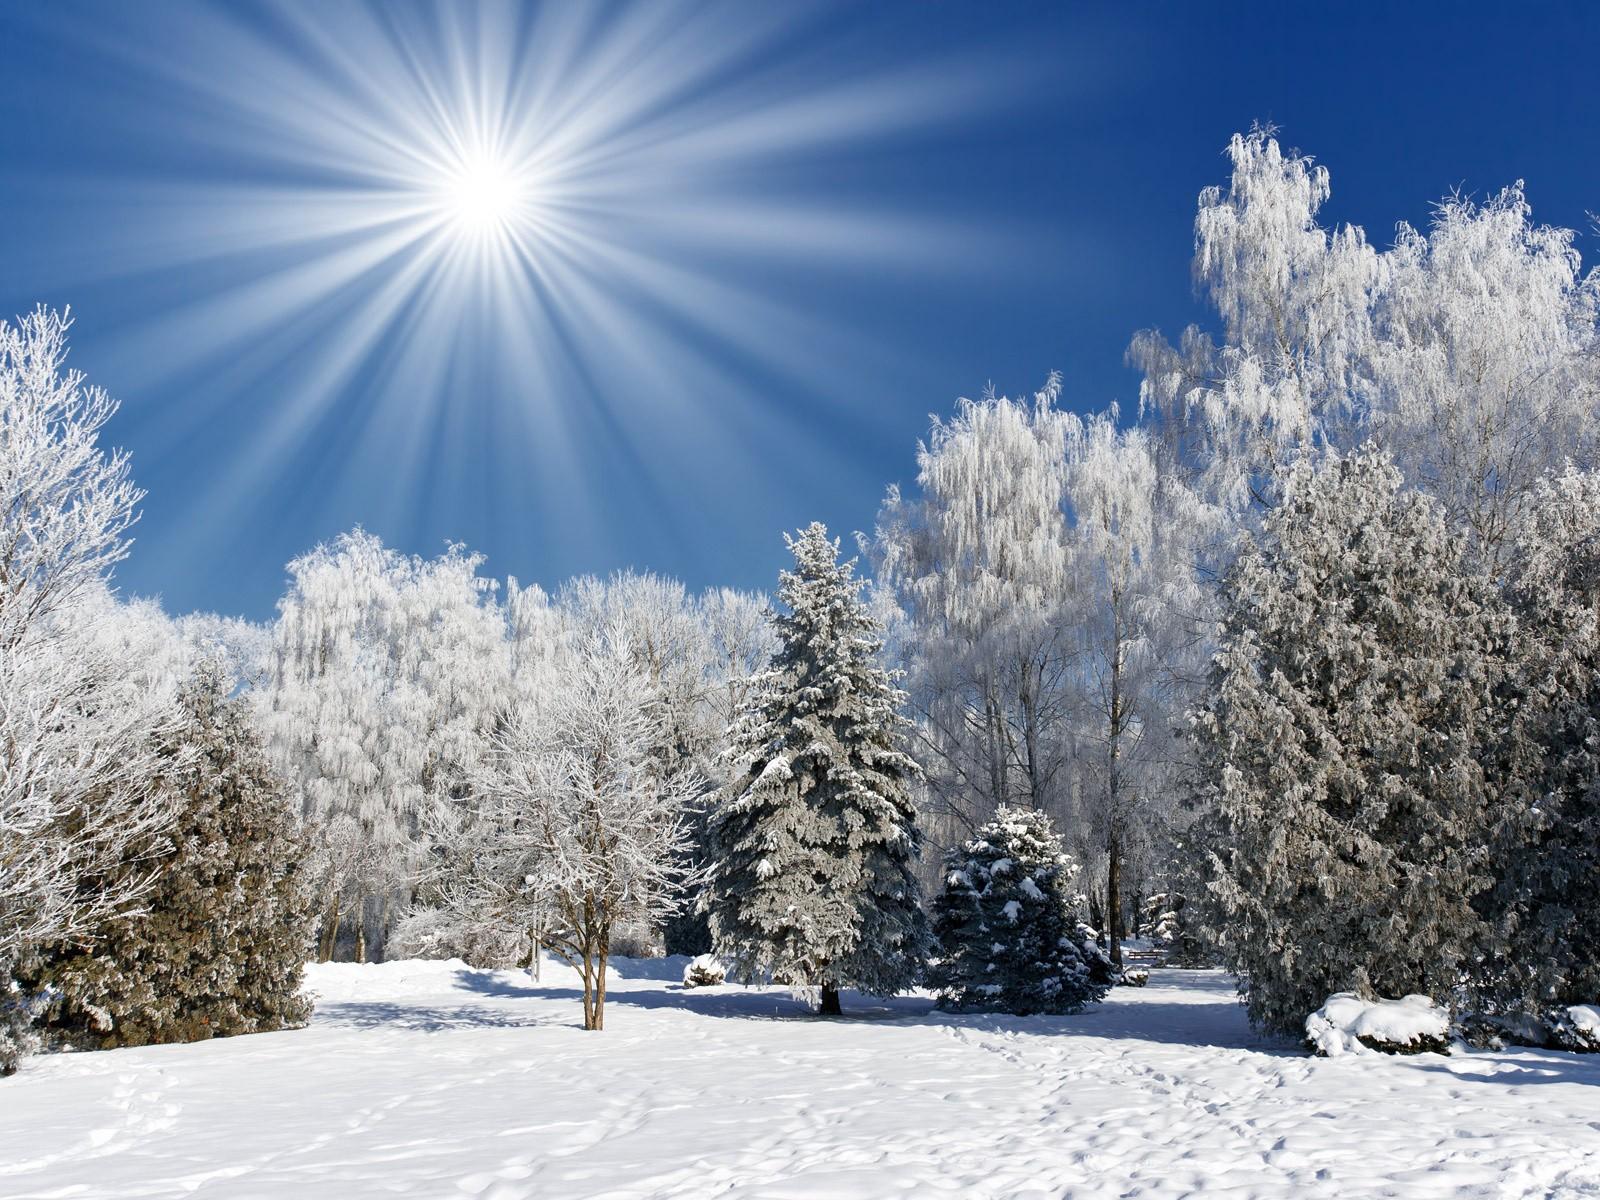 Sfondo Hd Inverno E Natura Sfondi Hd Gratis